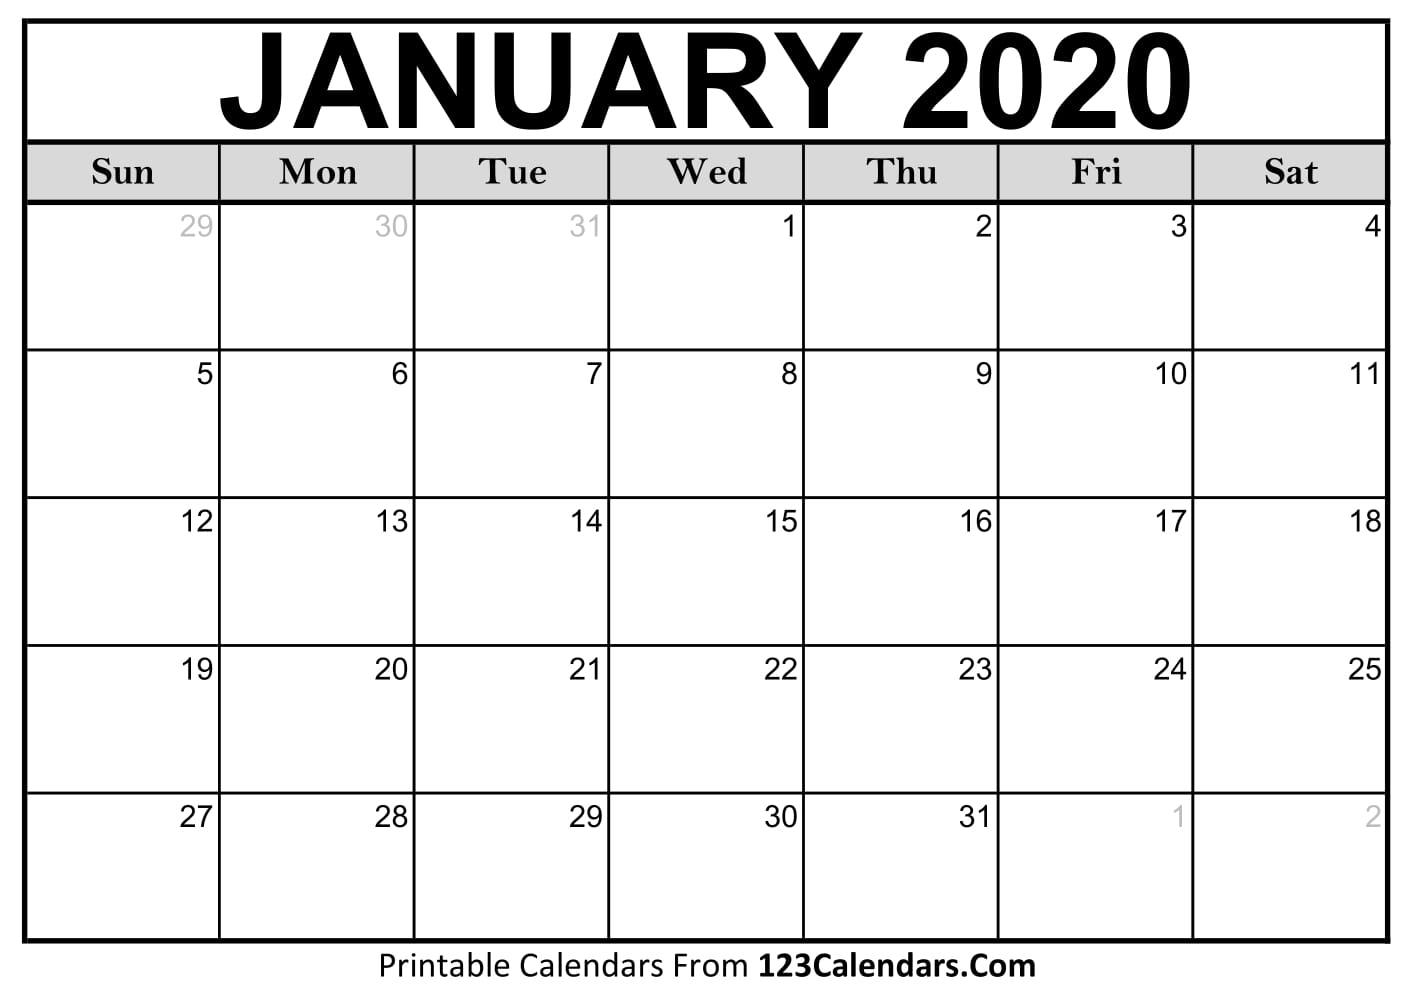 January 2020 Printable Calendar   123Calendars throughout Printable Calendar For 2020 To Type On